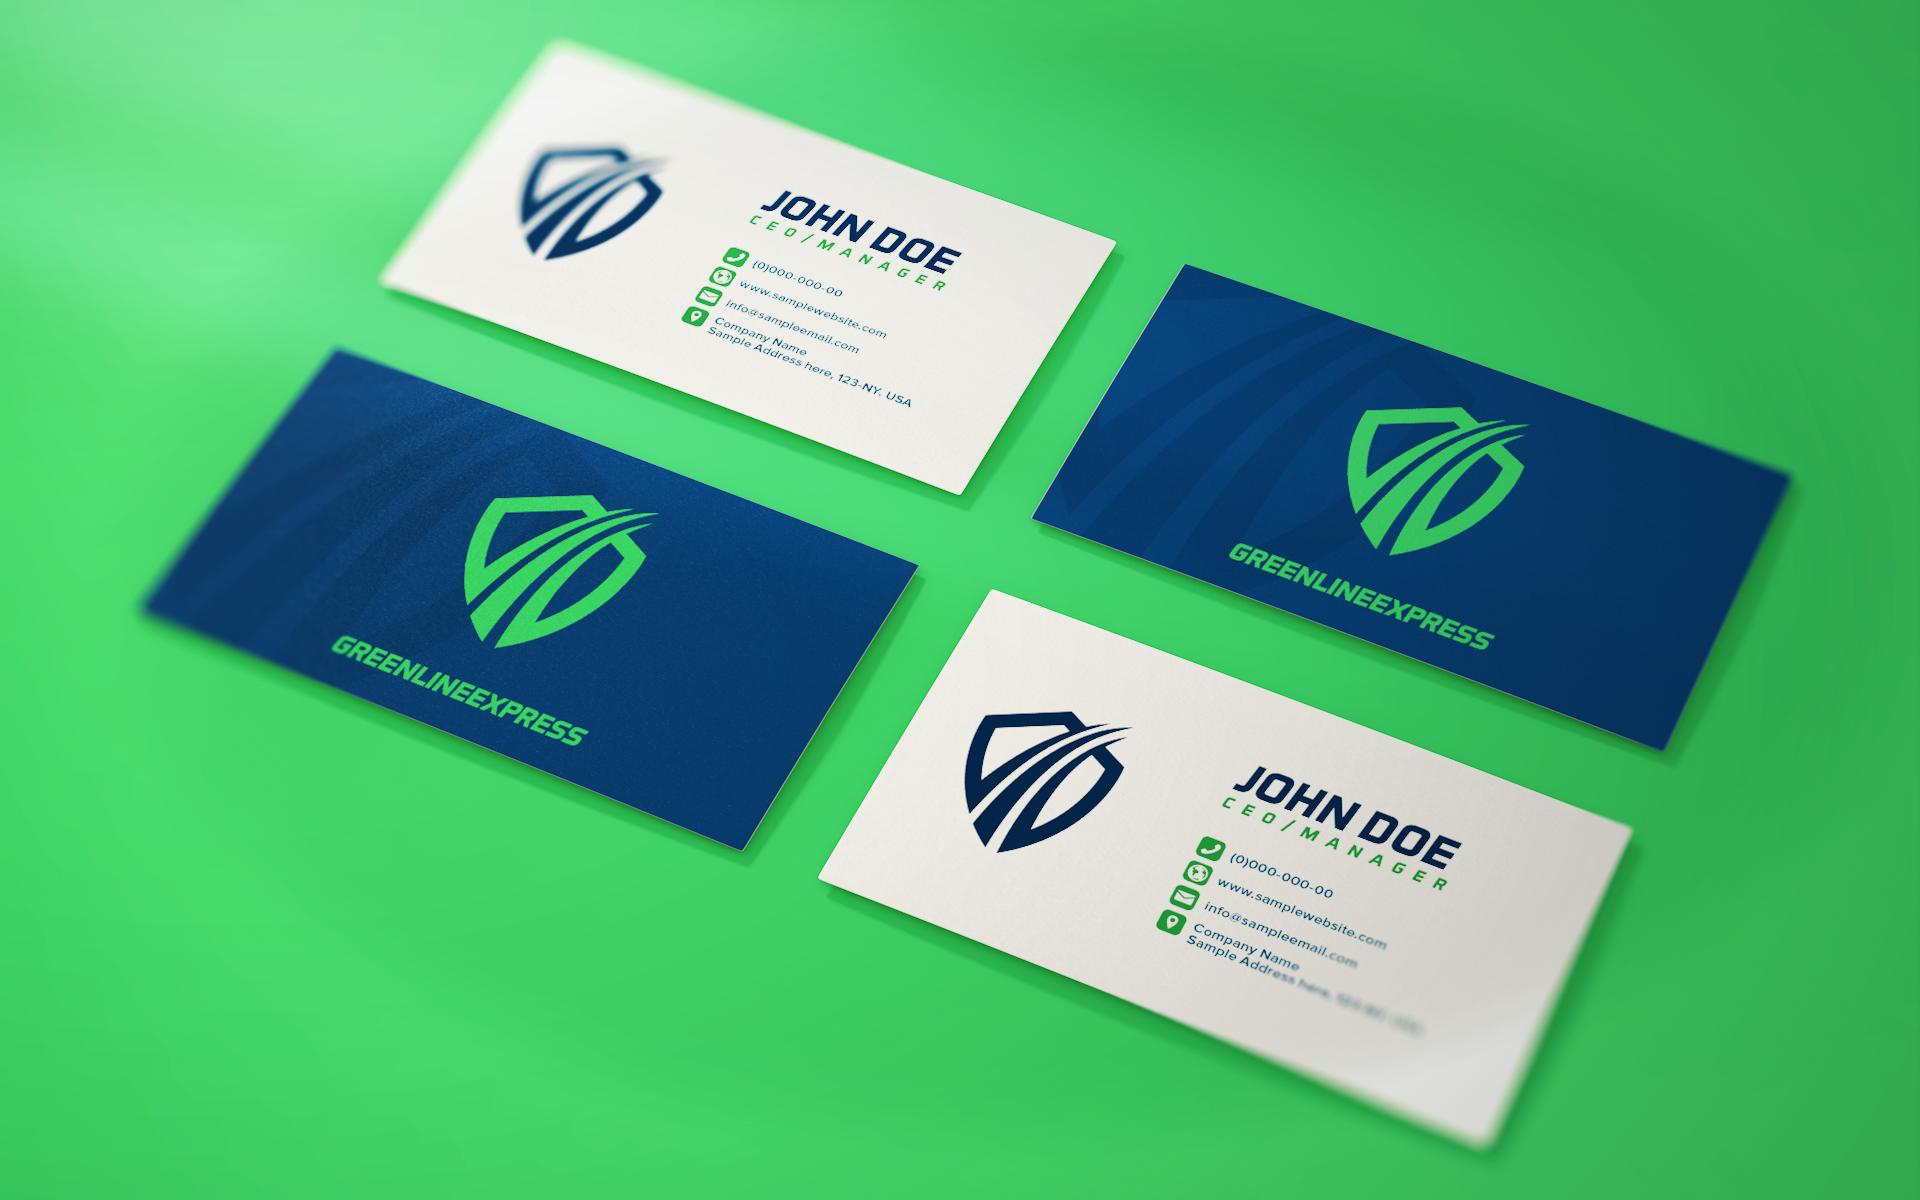 GREENLINE EXPRESS BUSINESS CARD DESIGN